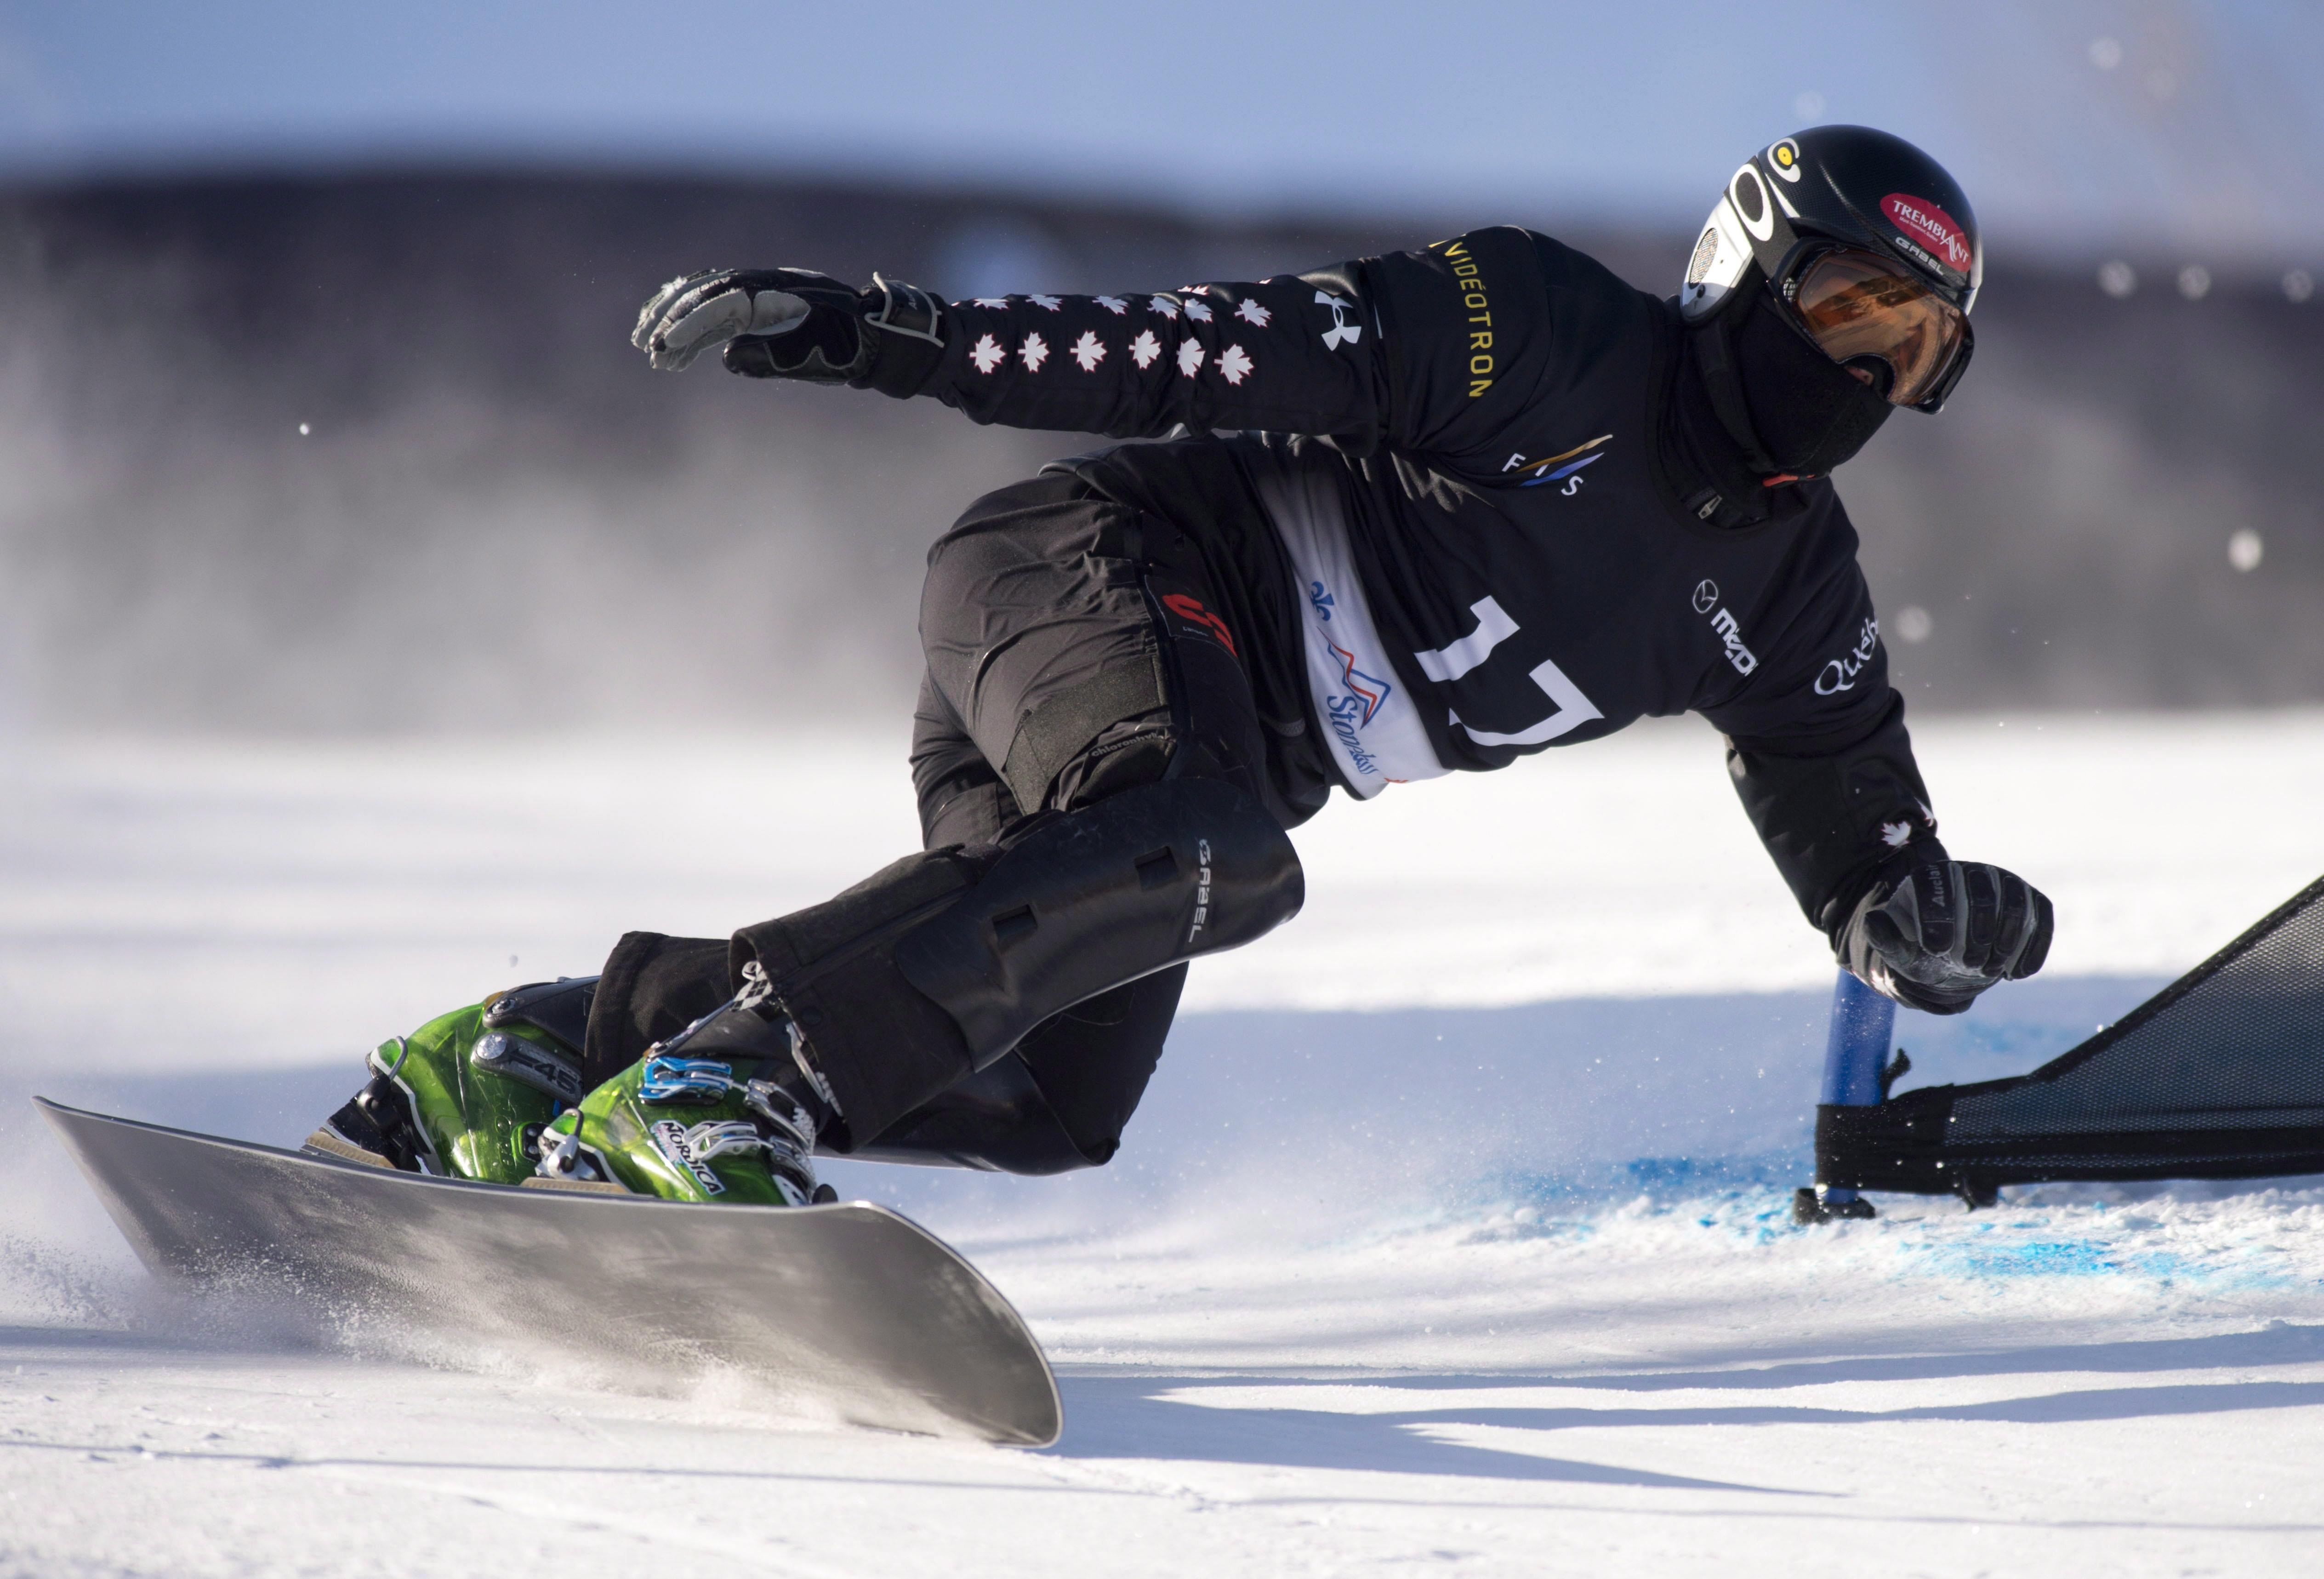 jasey jay anderson participera ses 6es jeux olympiques d hiver. Black Bedroom Furniture Sets. Home Design Ideas